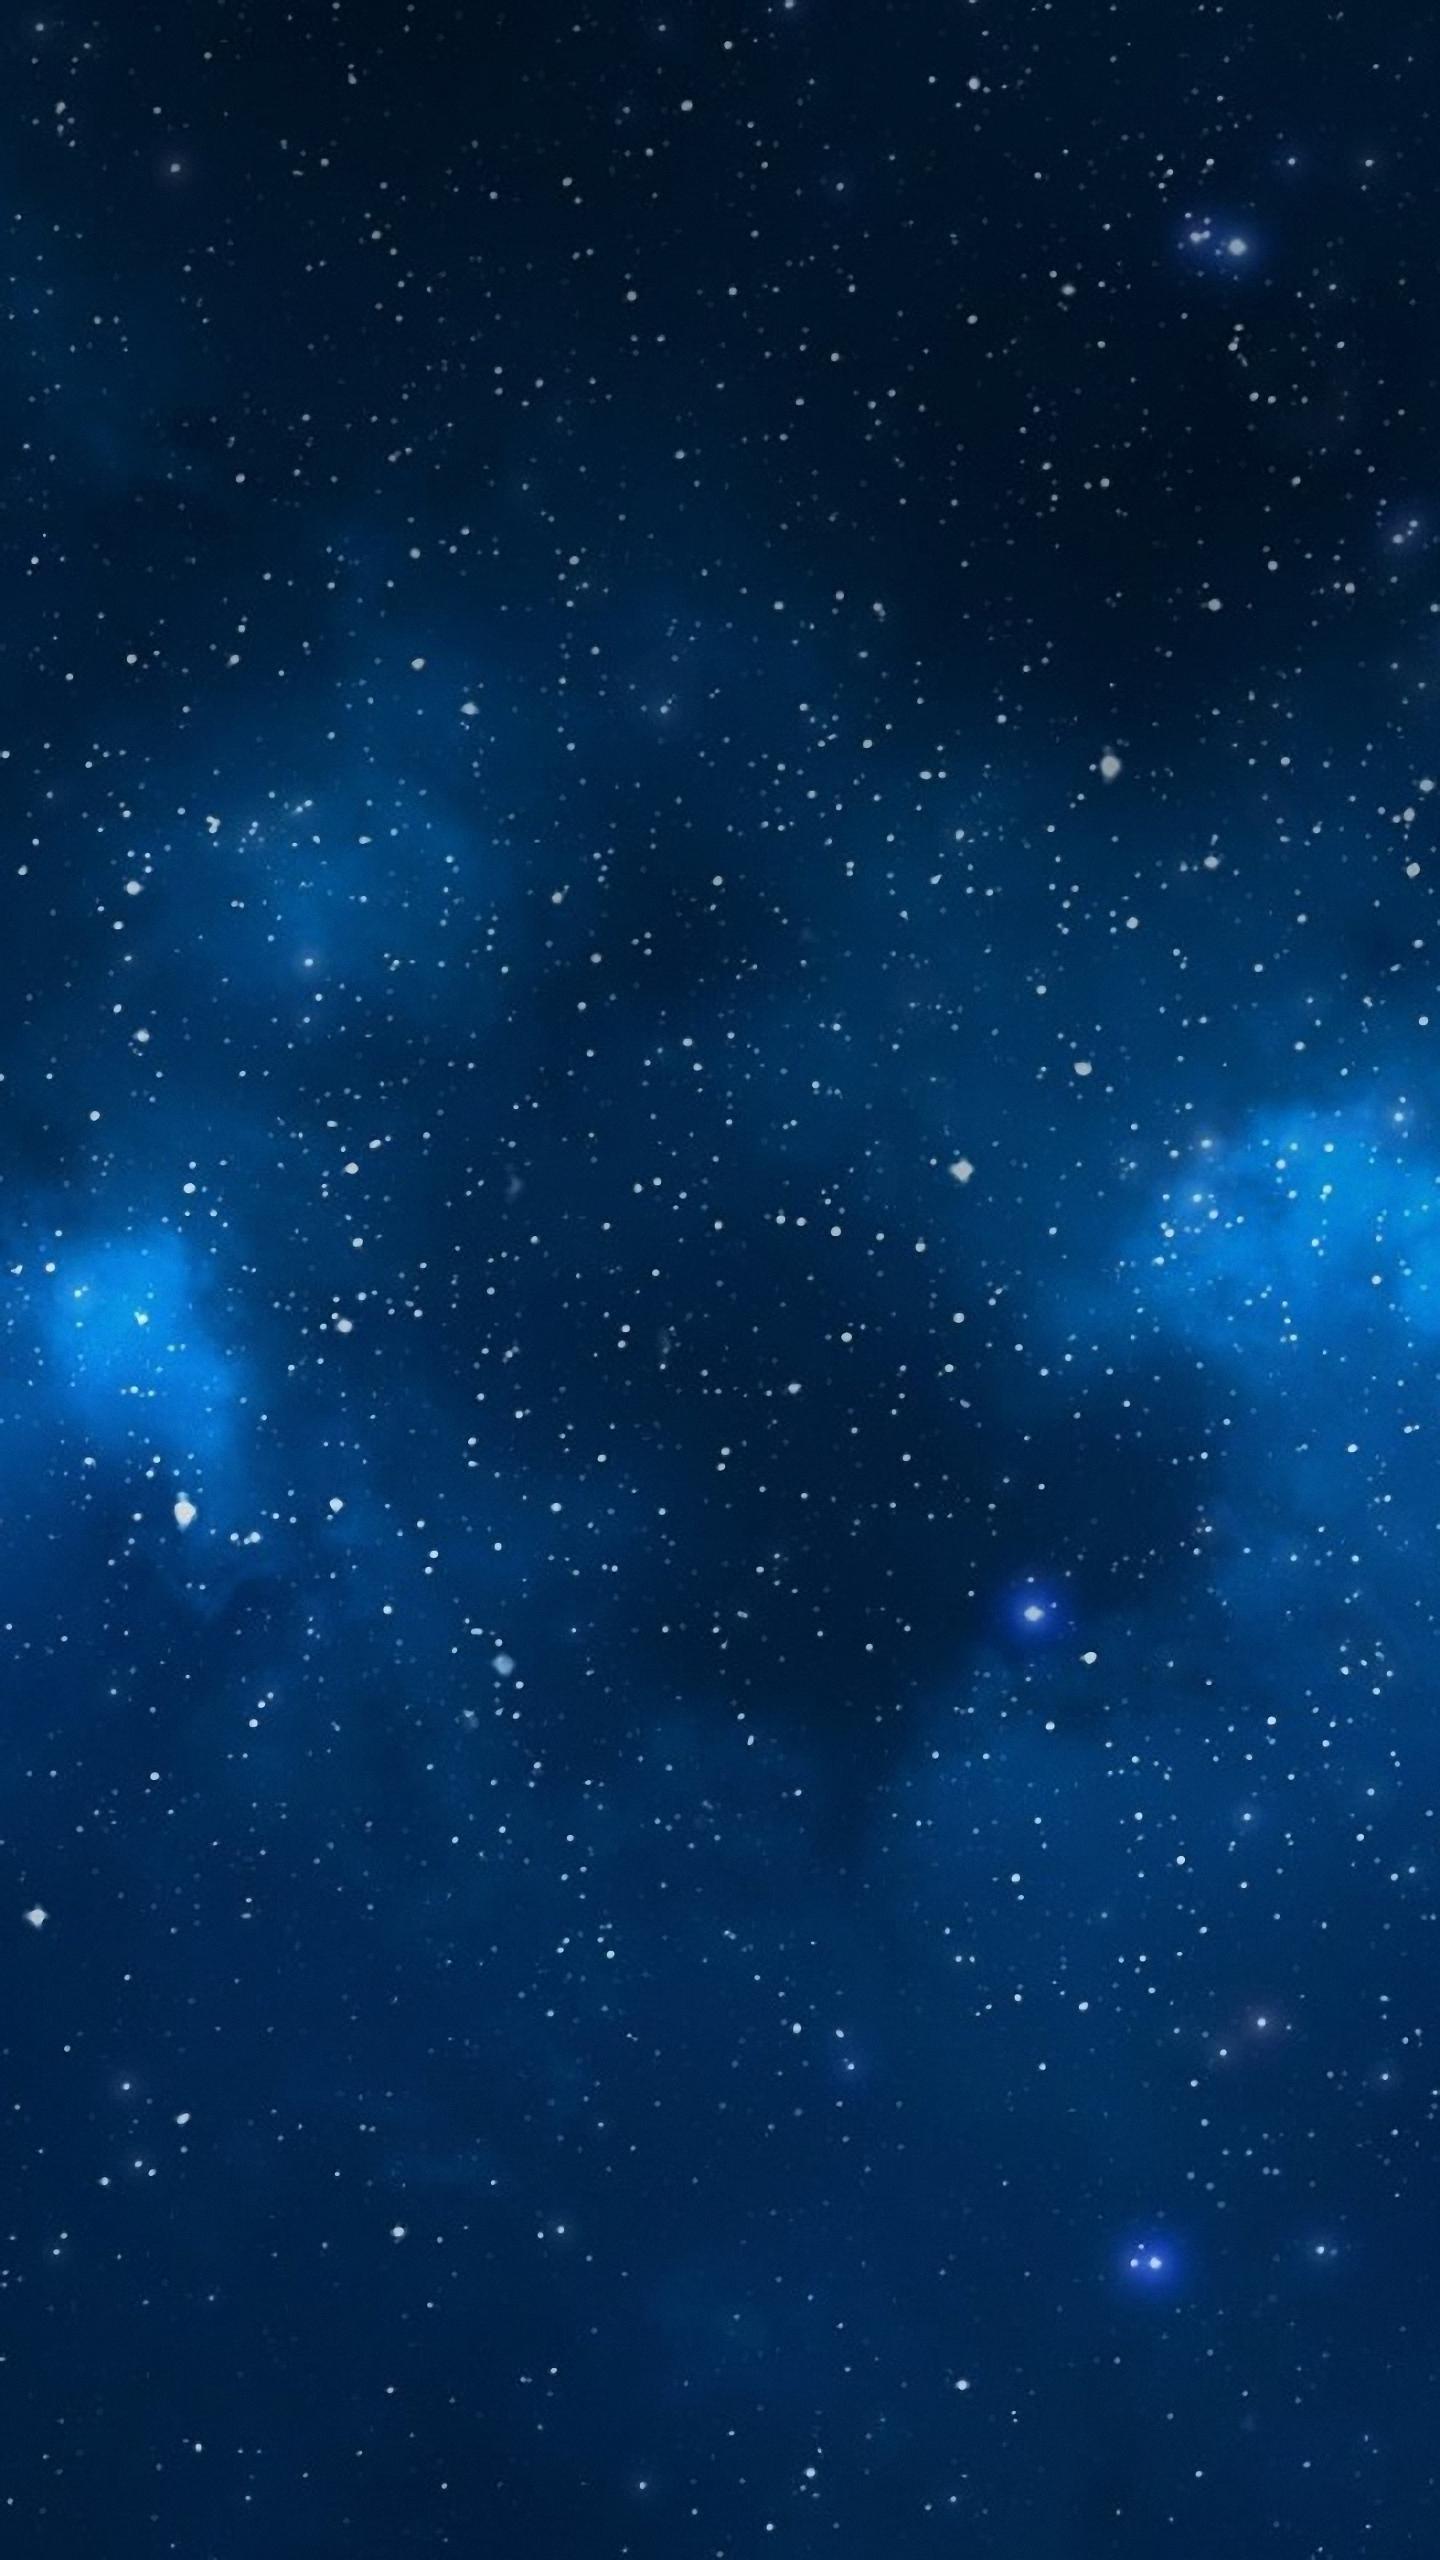 Ukraine Chernivtsi City samsung galaxy s6 Wallpapers HD 1440x2560 1440x2560